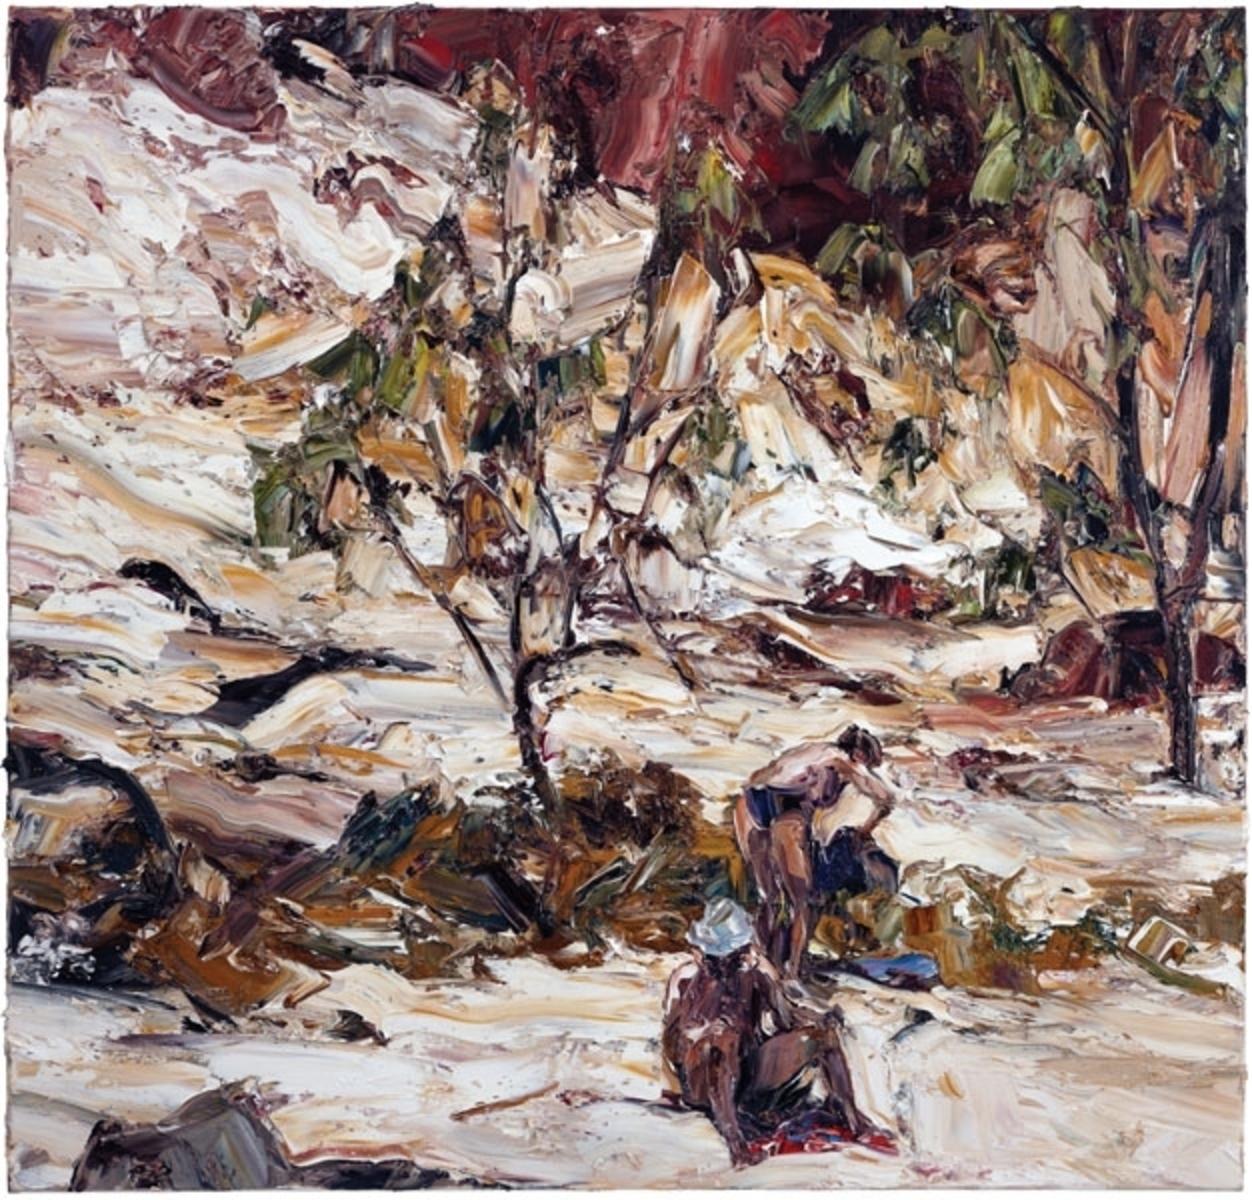 Estuary landscape (figures and red towel)